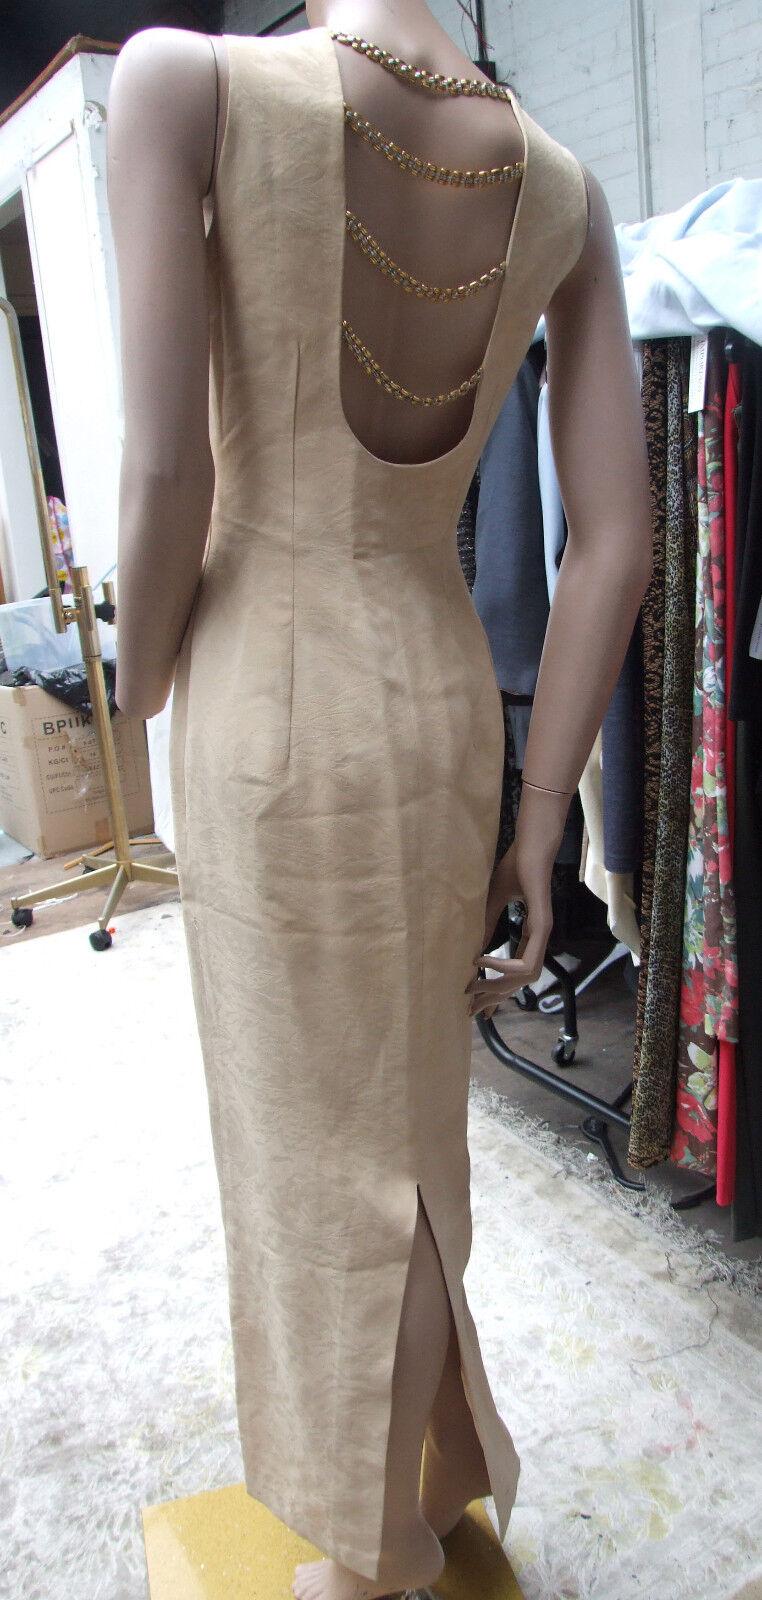 Sierra Designs London Sensational Long Beige Evening Open Back Dress with Chains